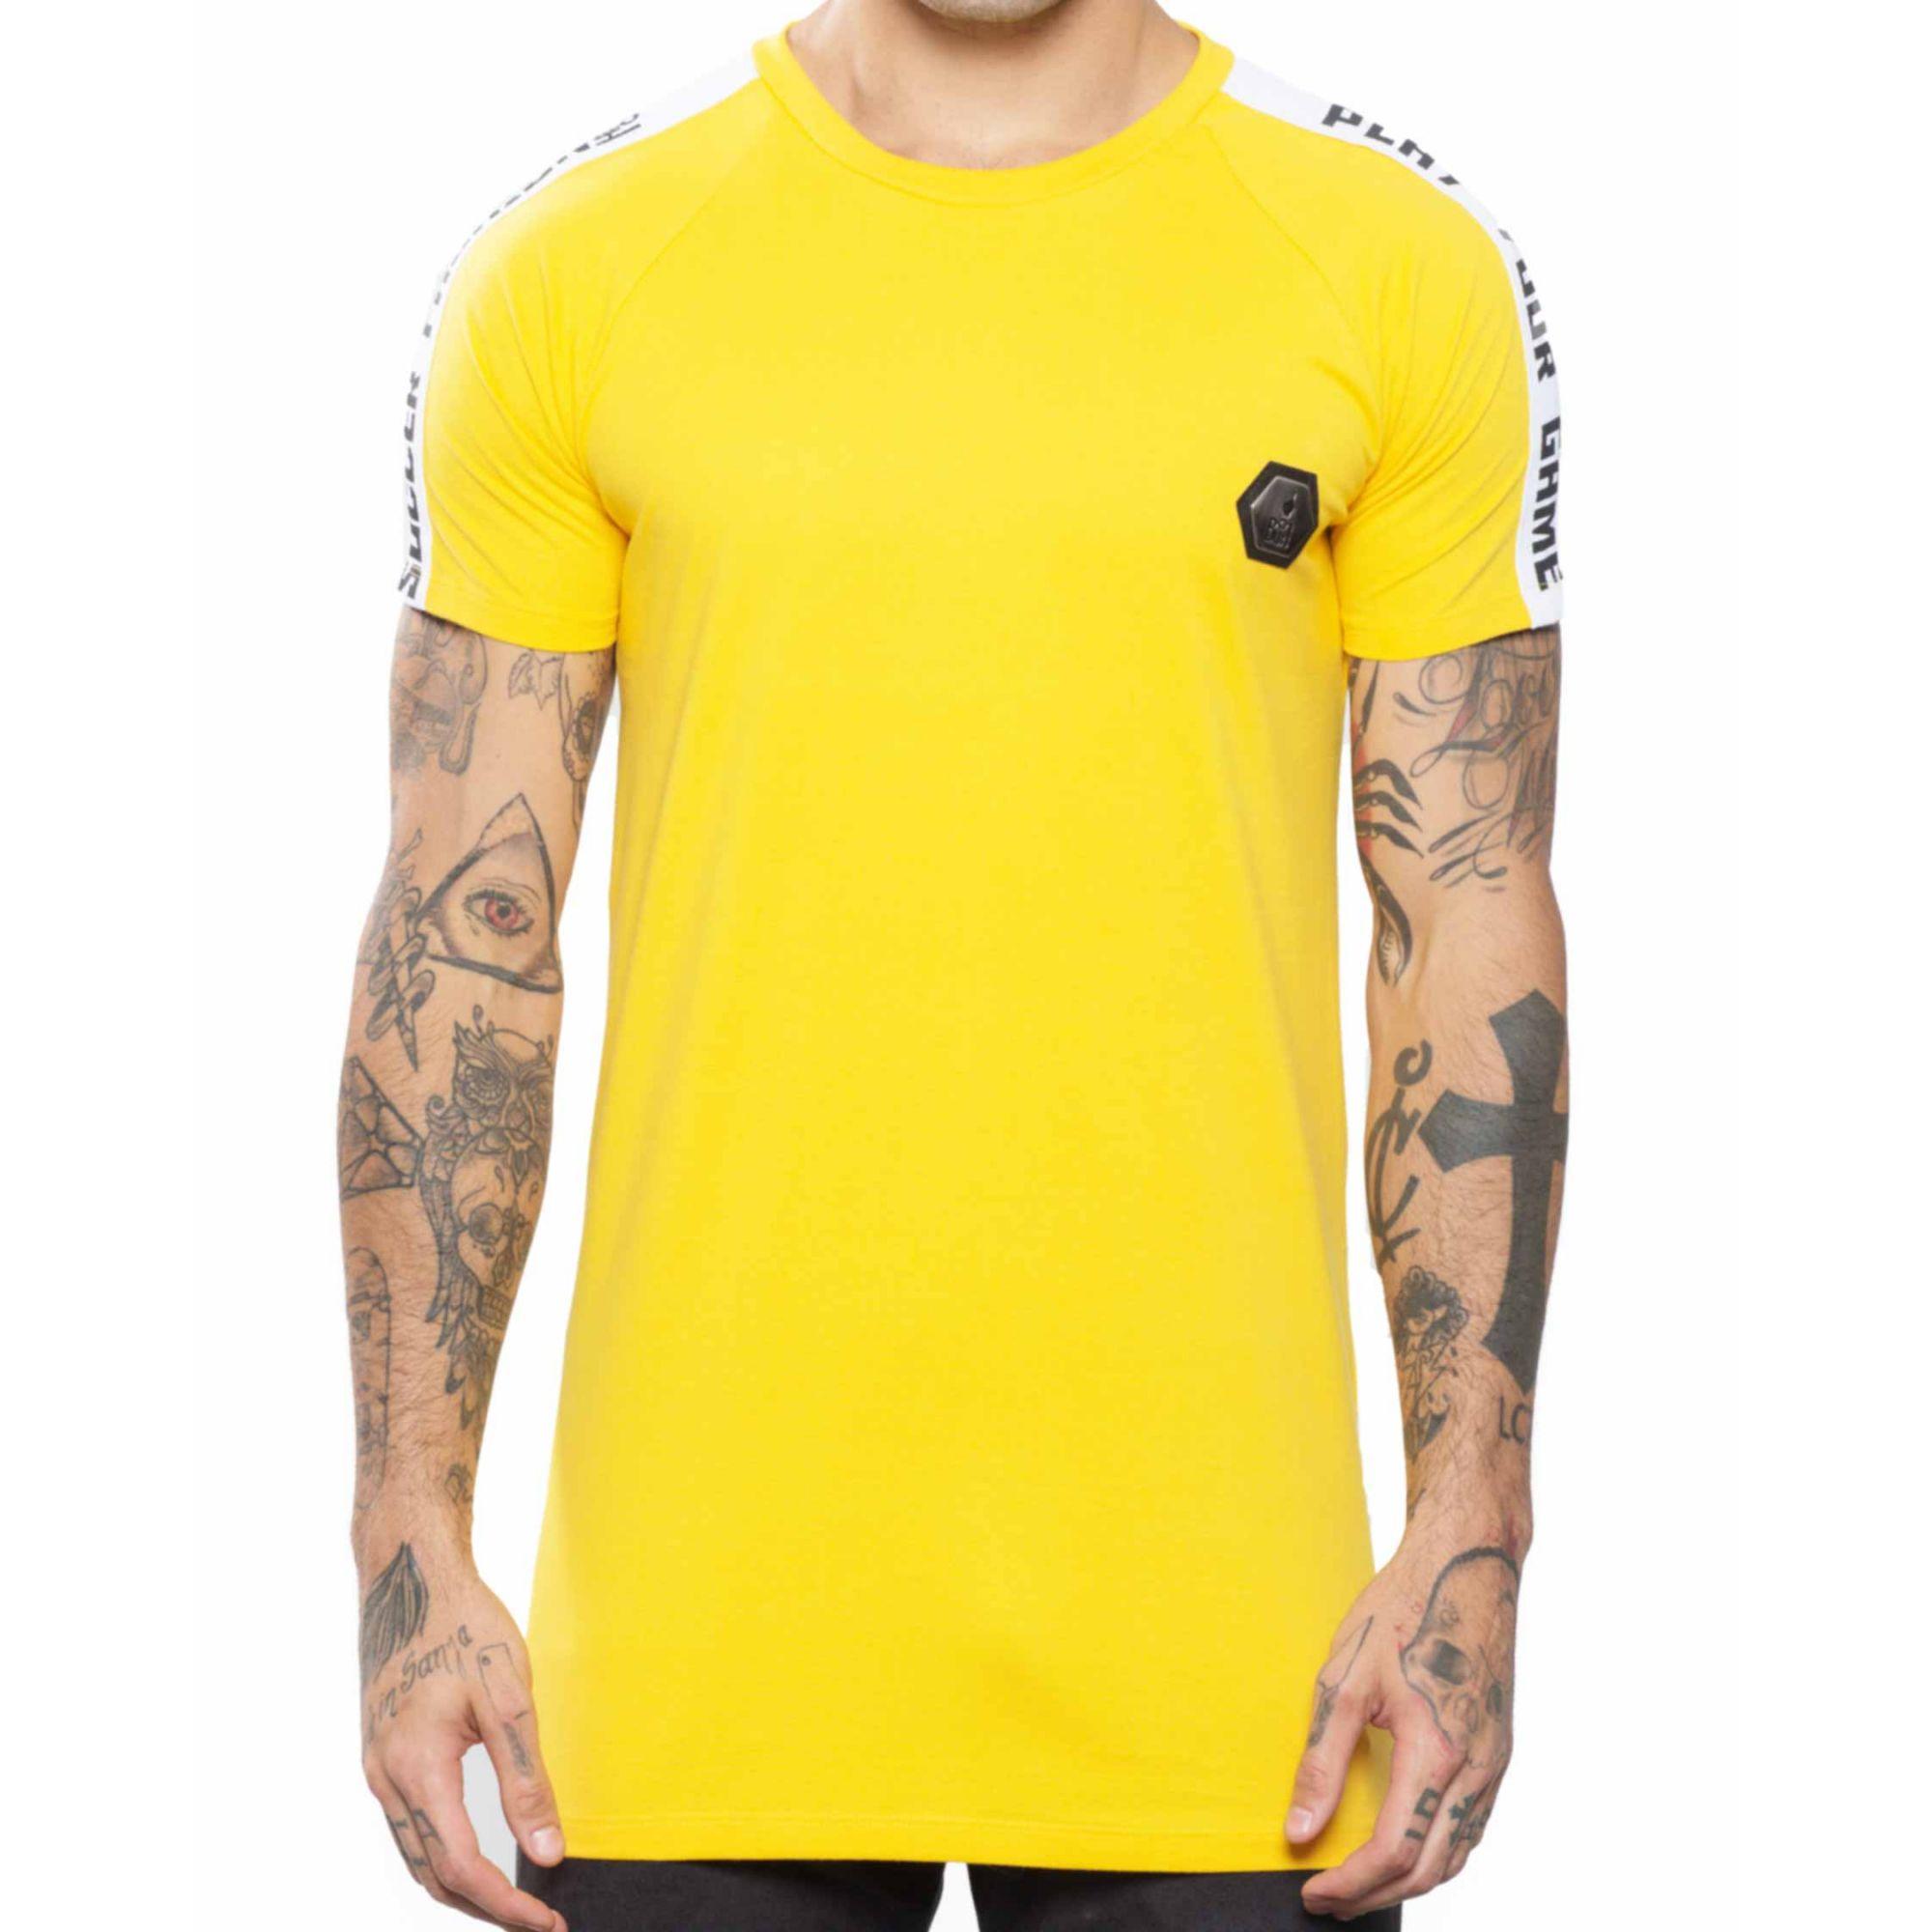 Camiseta Buh Recorte Placa Yellow